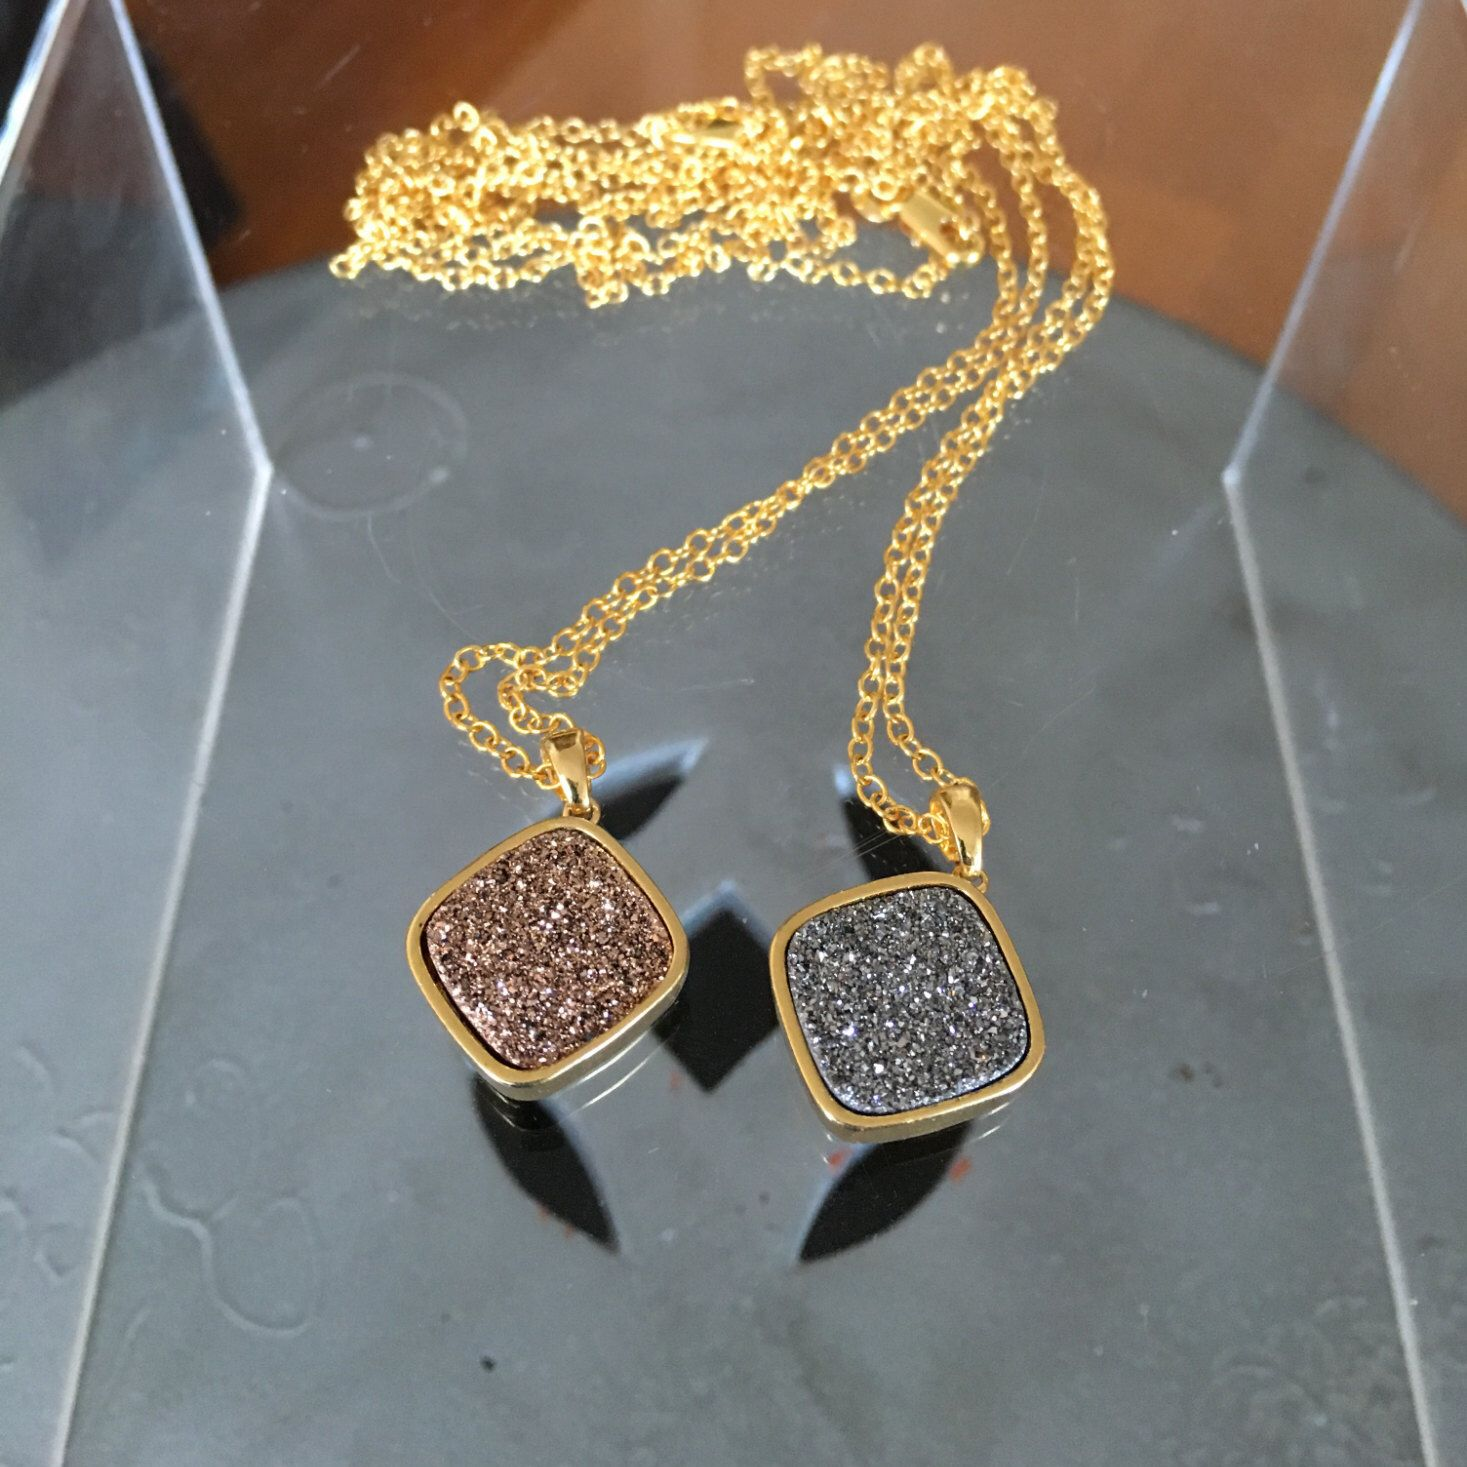 Druzy Necklace/Bezel Set Druzy/Square Druzy/Diamond Shape Druzy Necklace/Rose Druzy/Silver Druzy/Gold filled chain/ by LaDiiDaDiiDa on Etsy https://www.etsy.com/listing/272827834/druzy-necklacebezel-set-druzysquare